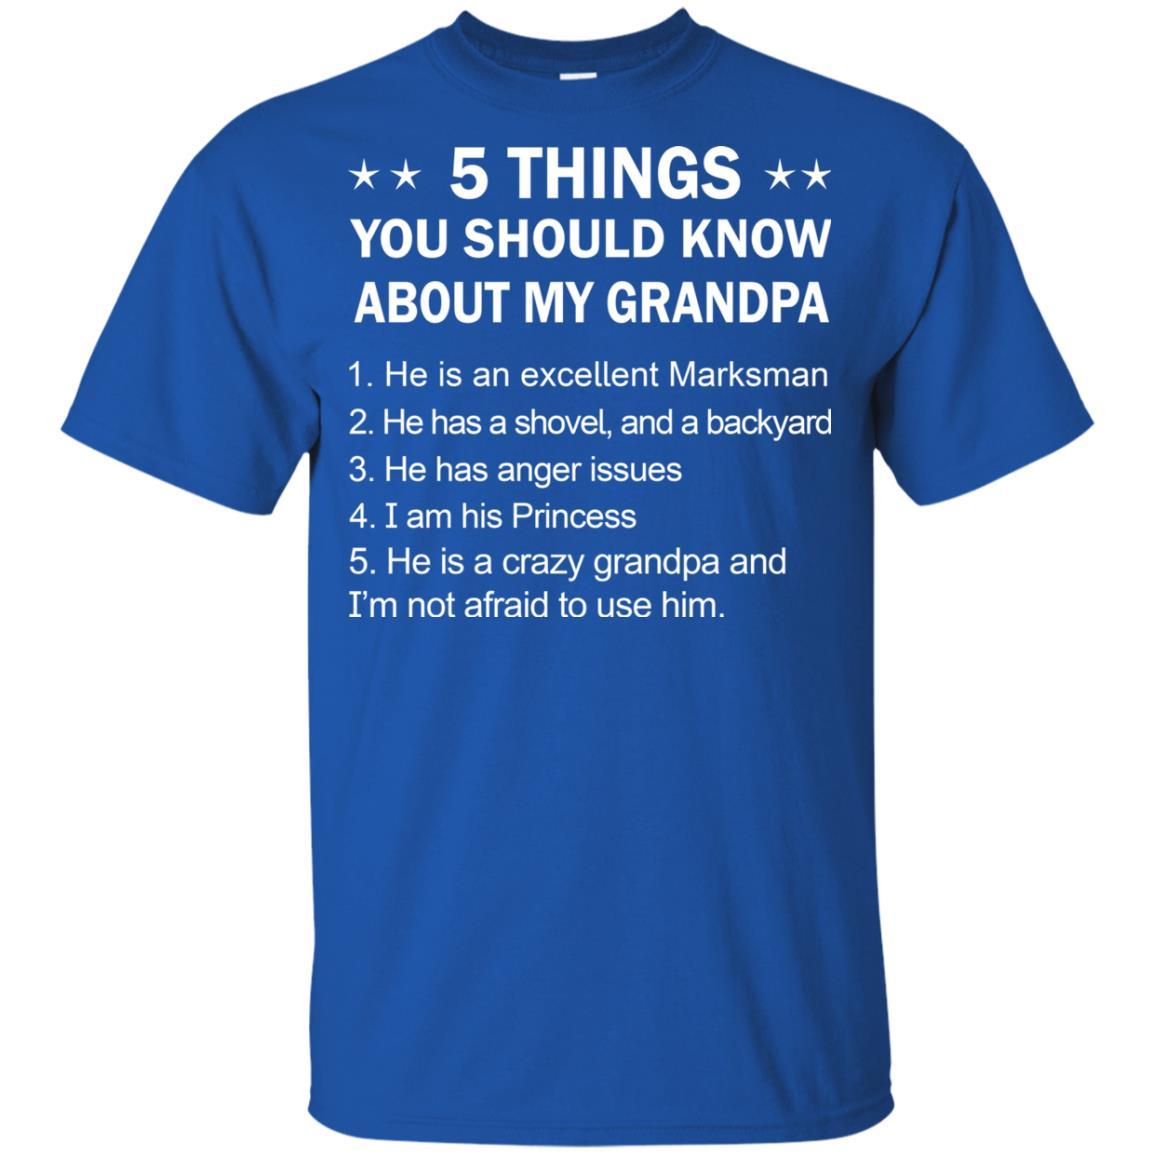 image 2333 - 5 Things You Should Know My Grandpa Shirt, Youth Shirt